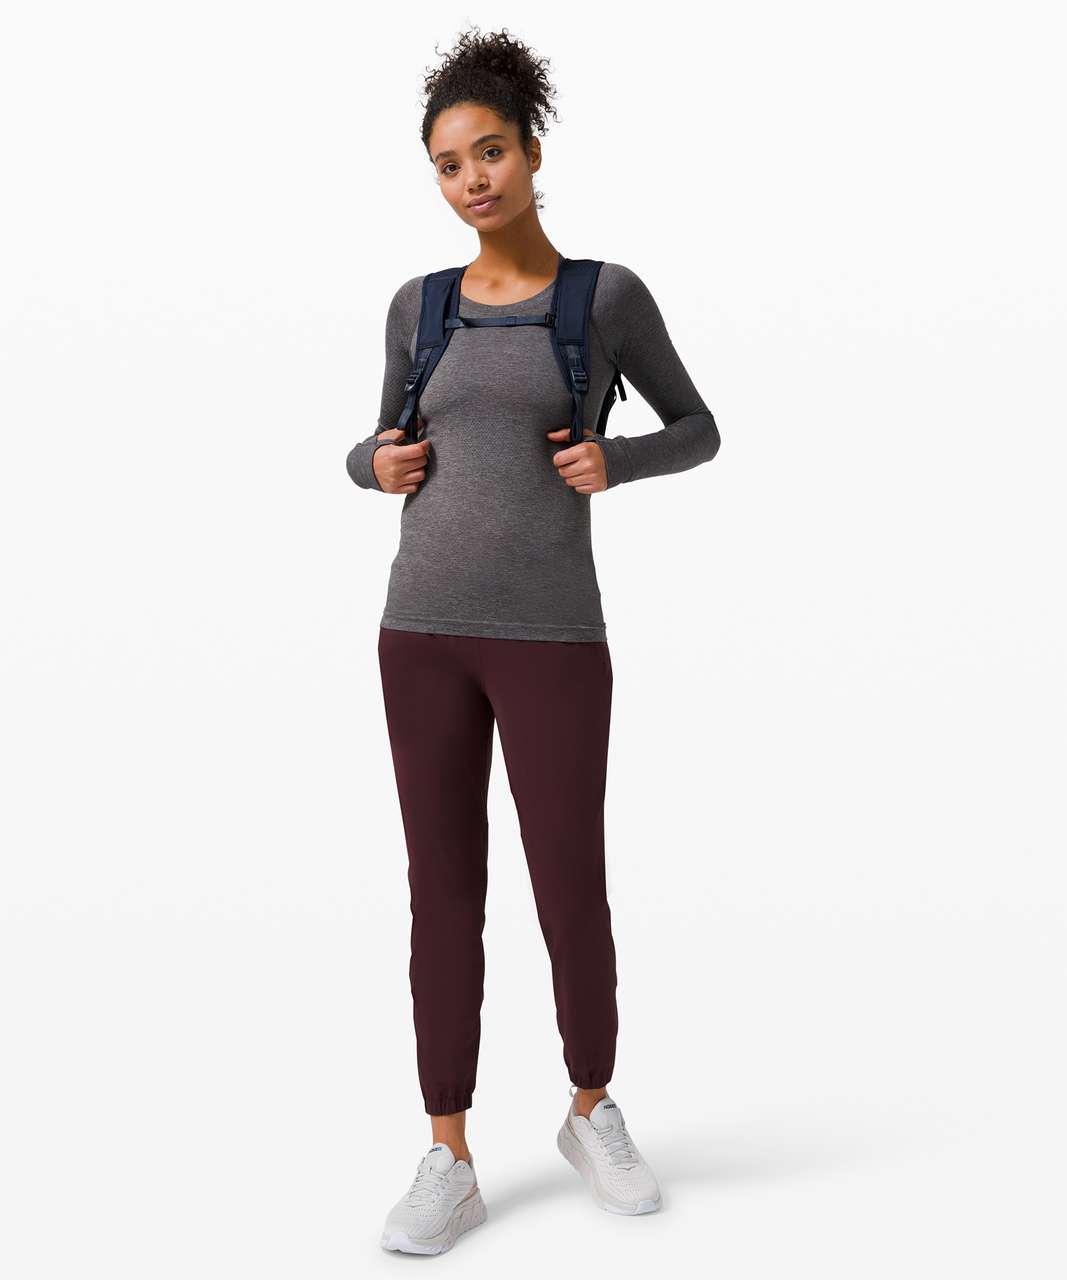 Lululemon Swiftly Tech Long Sleeve 2.0 - Slate / Graphite Grey